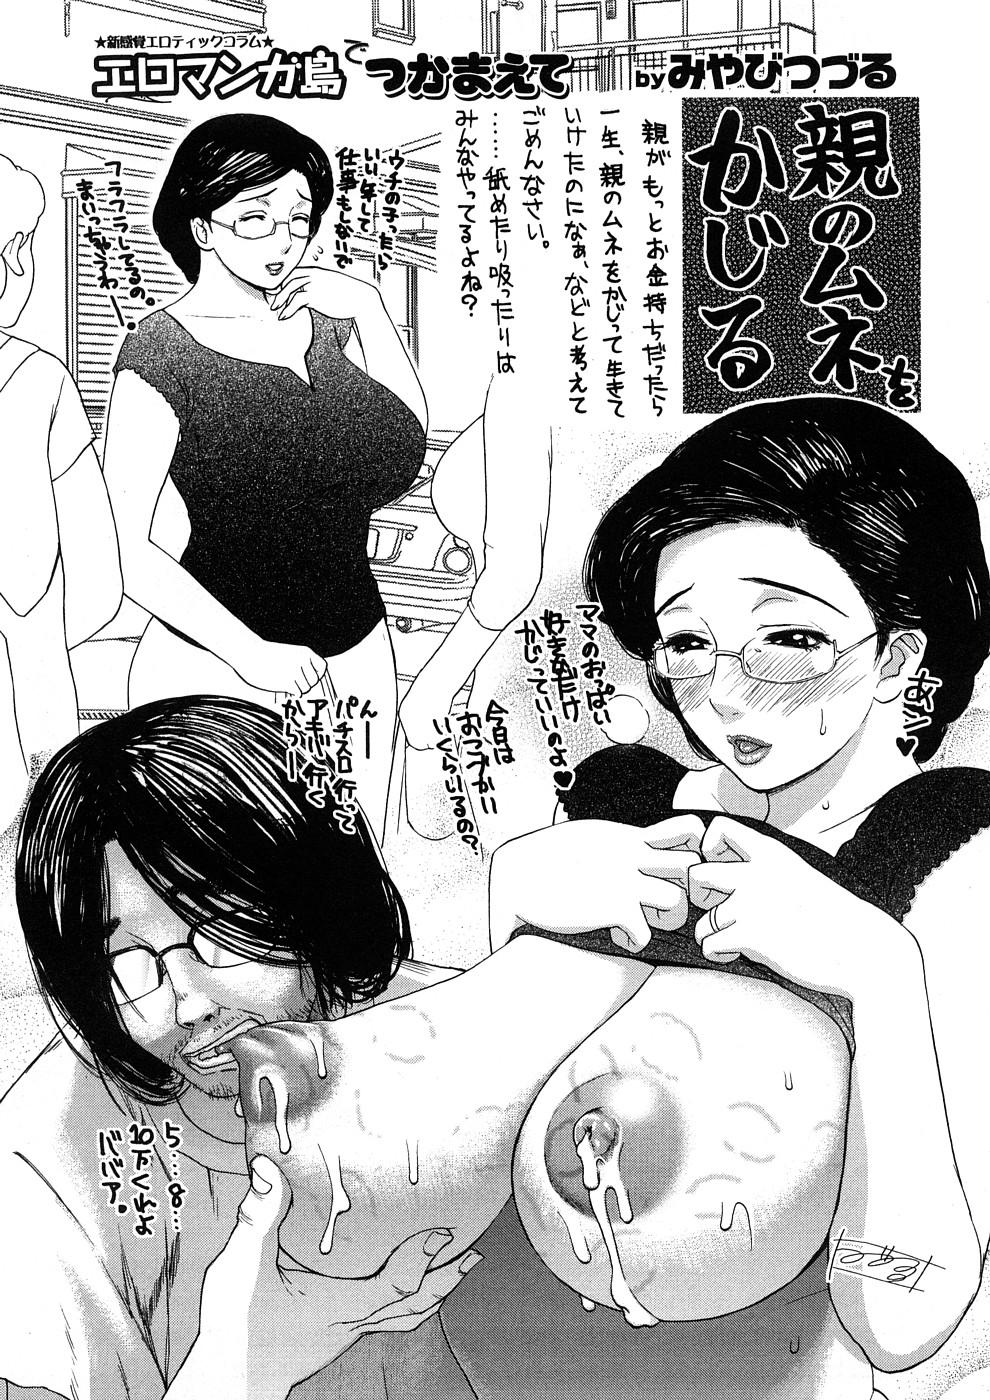 Geki Yaba Anthology Vol. 1 - Naka ni Dashite yo 241